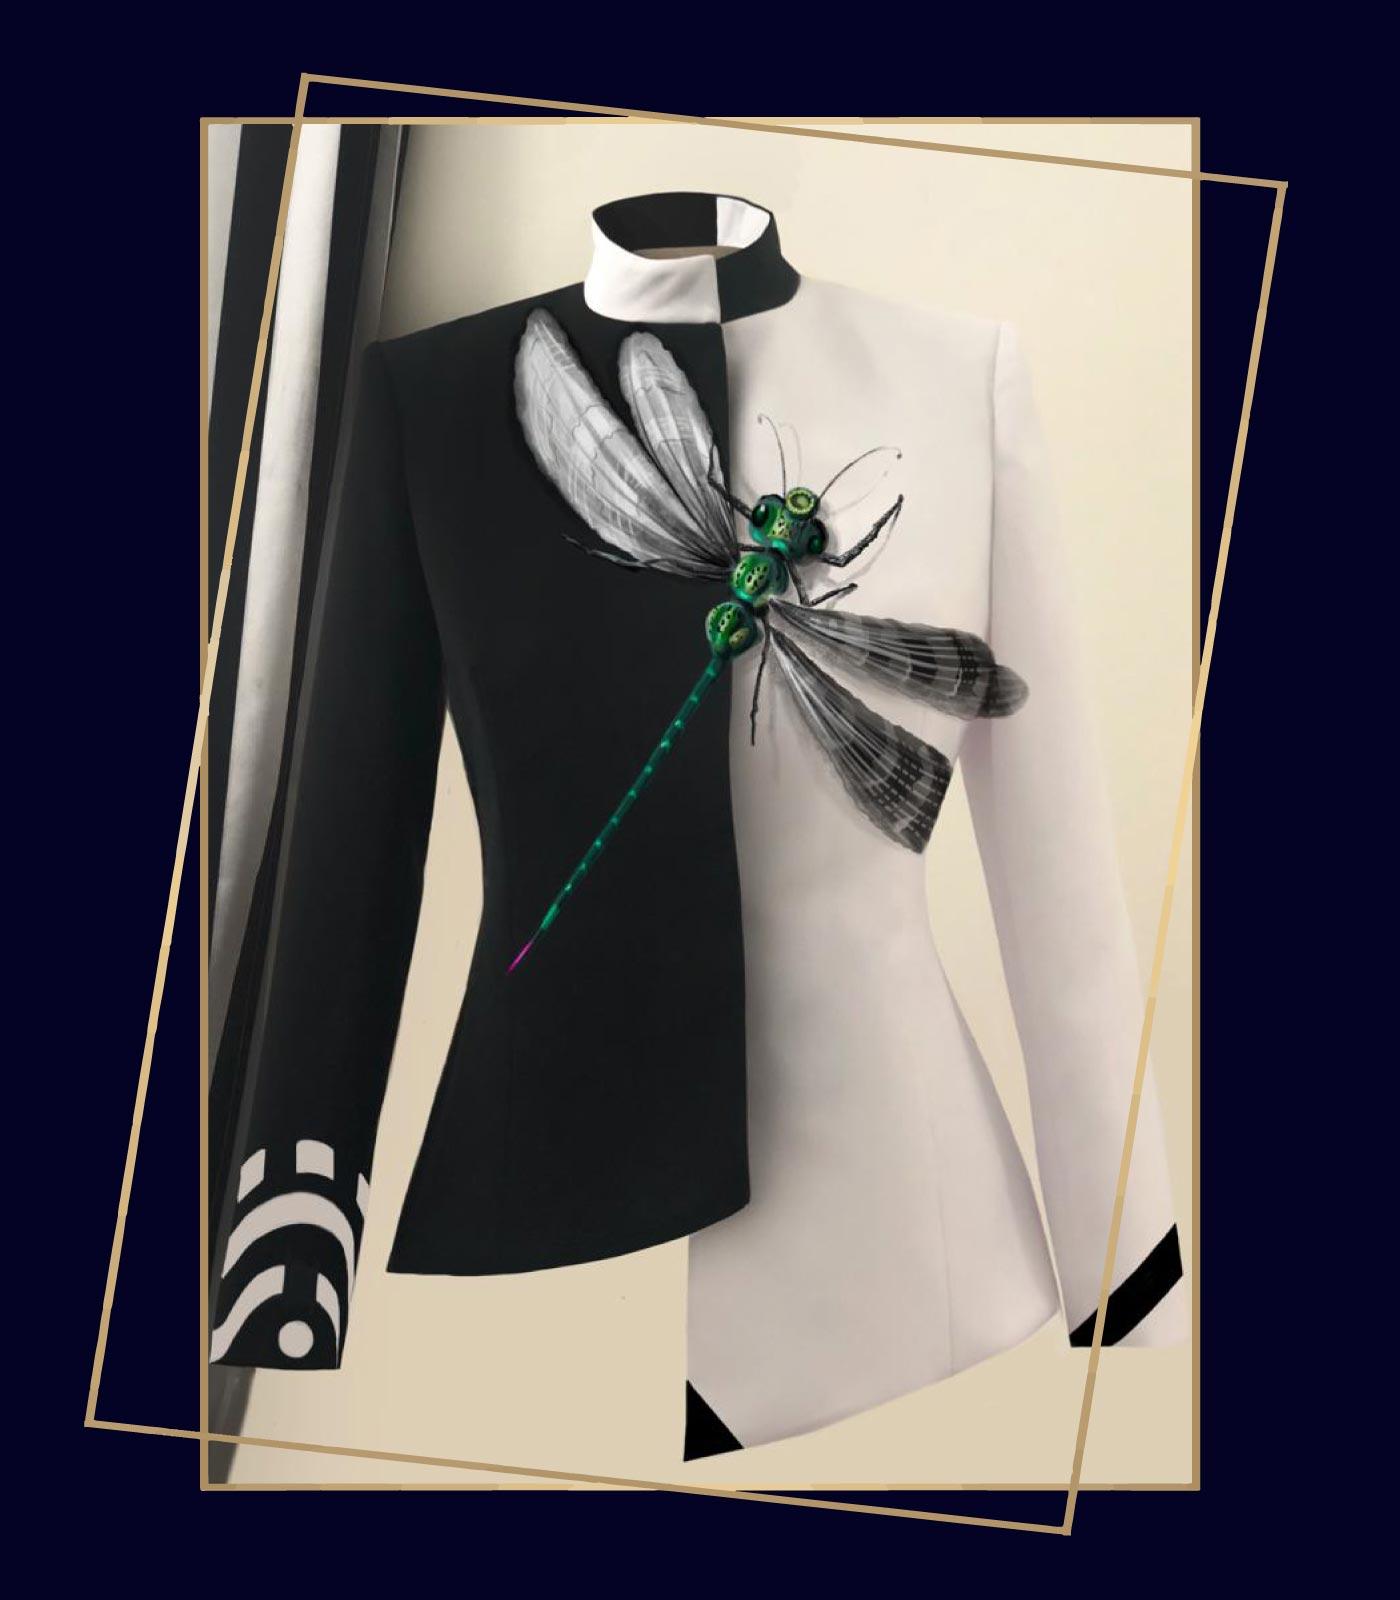 giacche eleganti donne bianca e nera con libellula verde